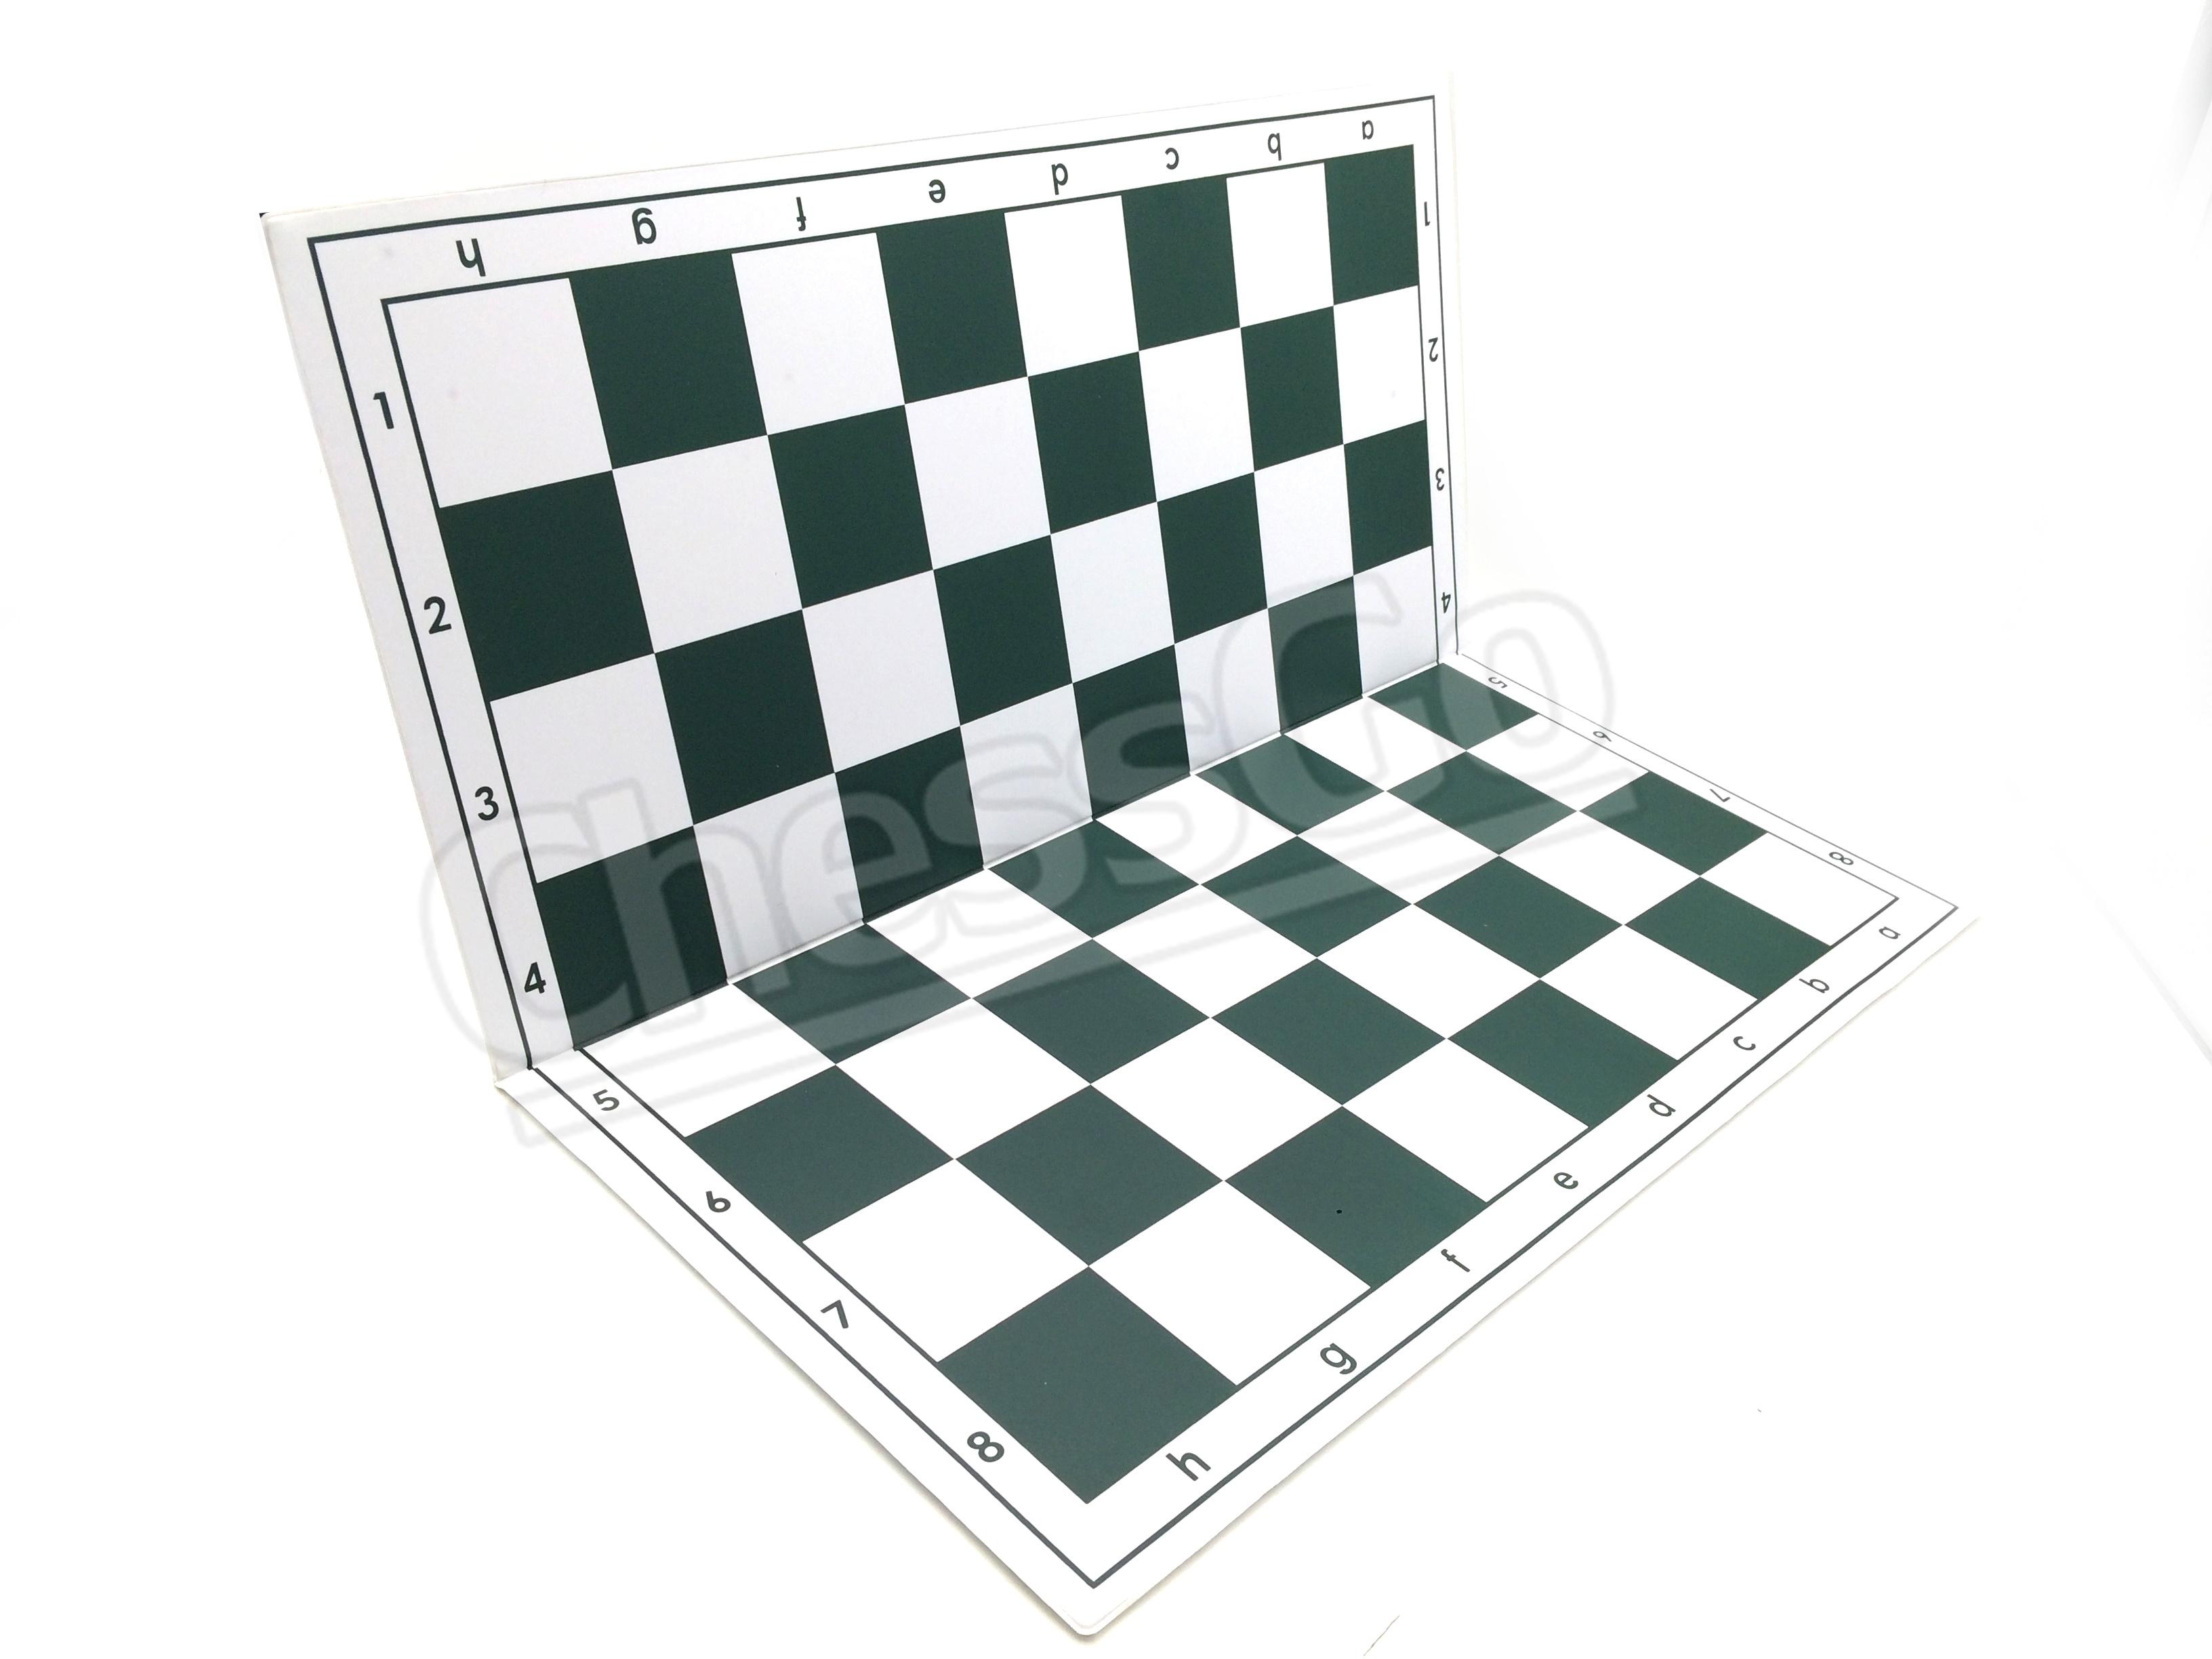 "20"" PU Fold Chess Board กระดานหมากรุกแบบพับมาตรฐาน"